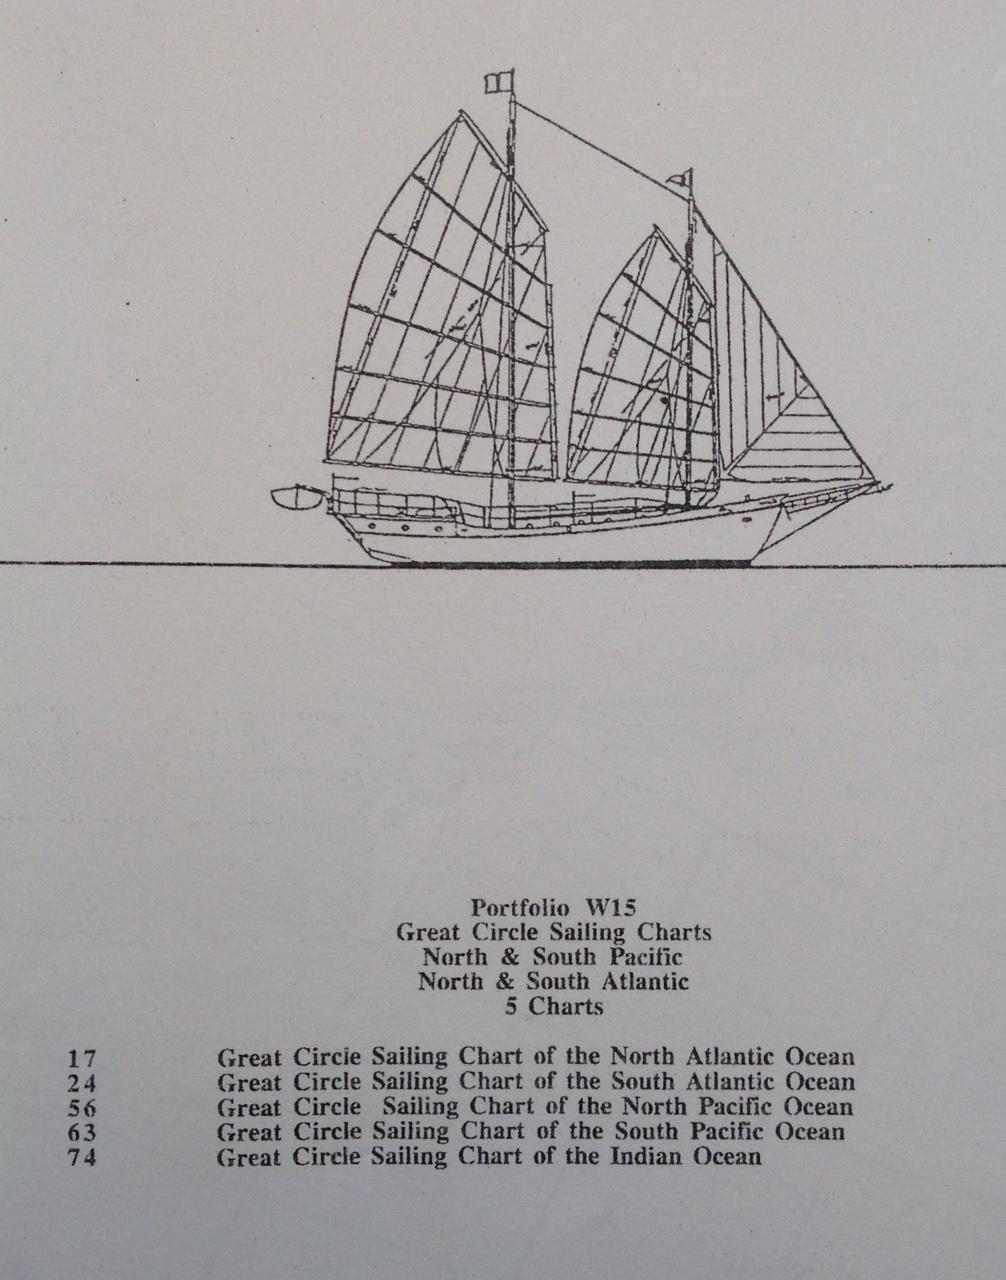 Click image for larger version  Name:Portfolio W15  Great Circle Sailing Charts   5 Charts.jpg Views:45 Size:368.0 KB ID:173813